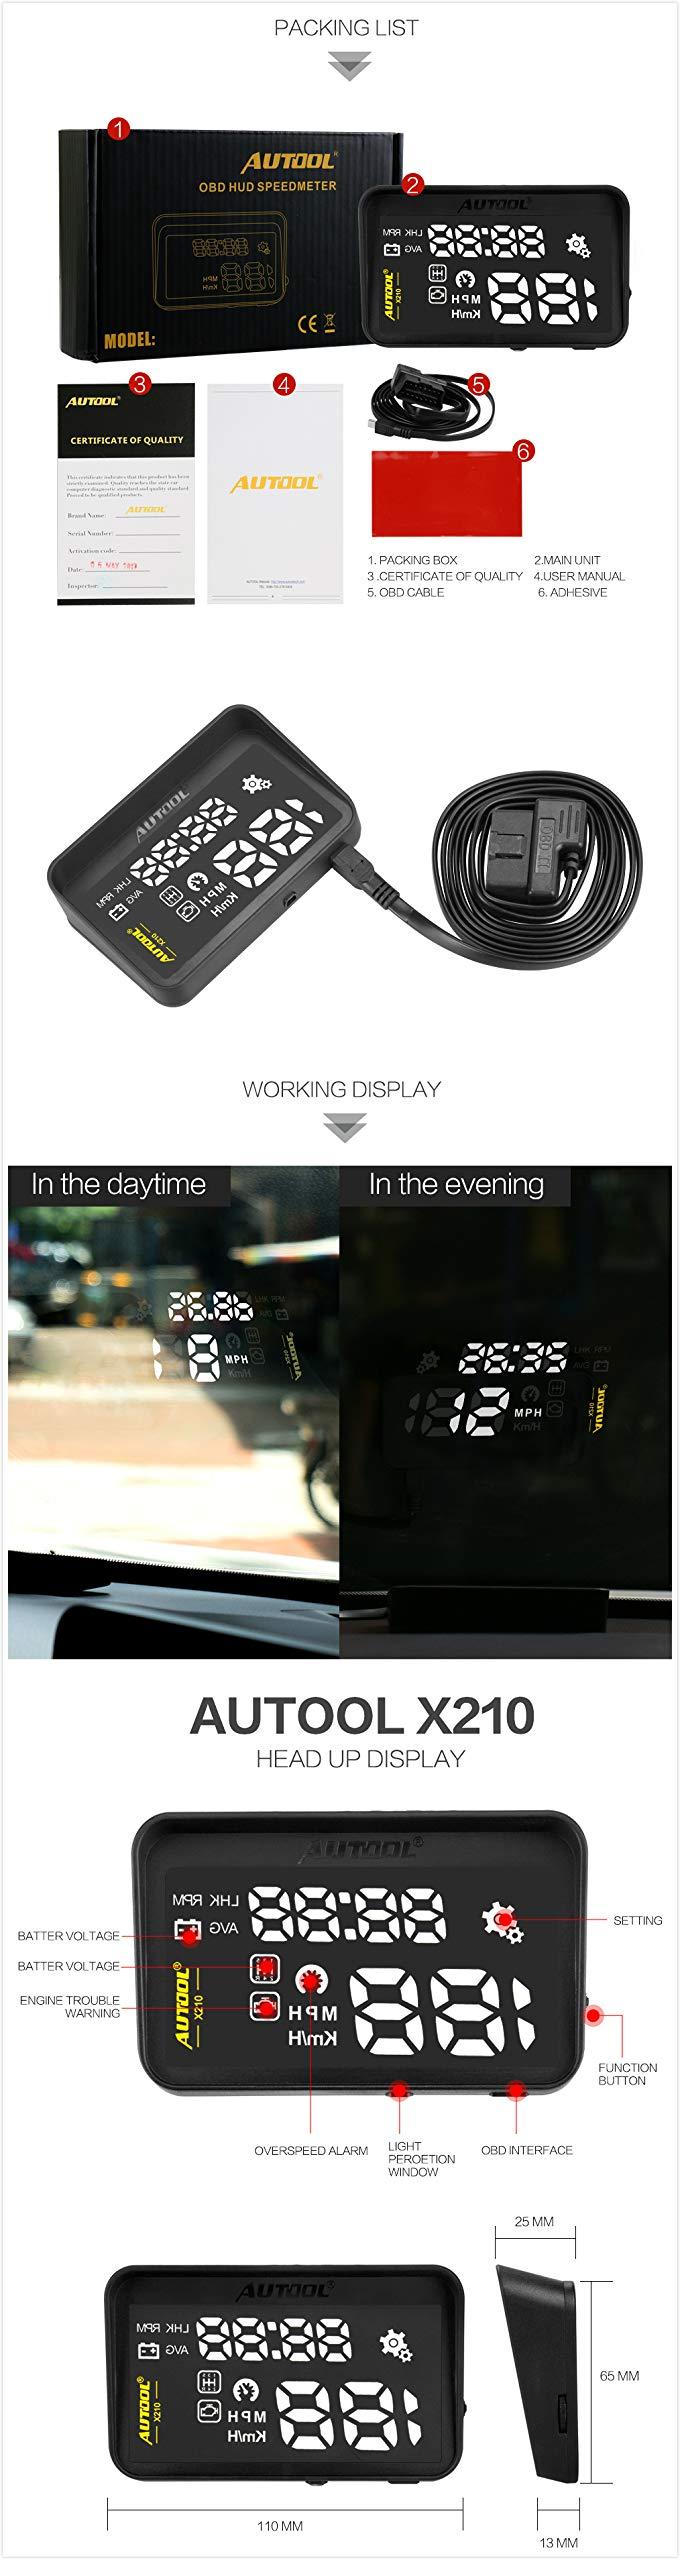 YARUIFANSENSJ AUTOOL X210 Auto HUD Car Head Up Display Digital Speed Windshield Projector Vehicle Projection Automotive OBD 2 II Speedometer